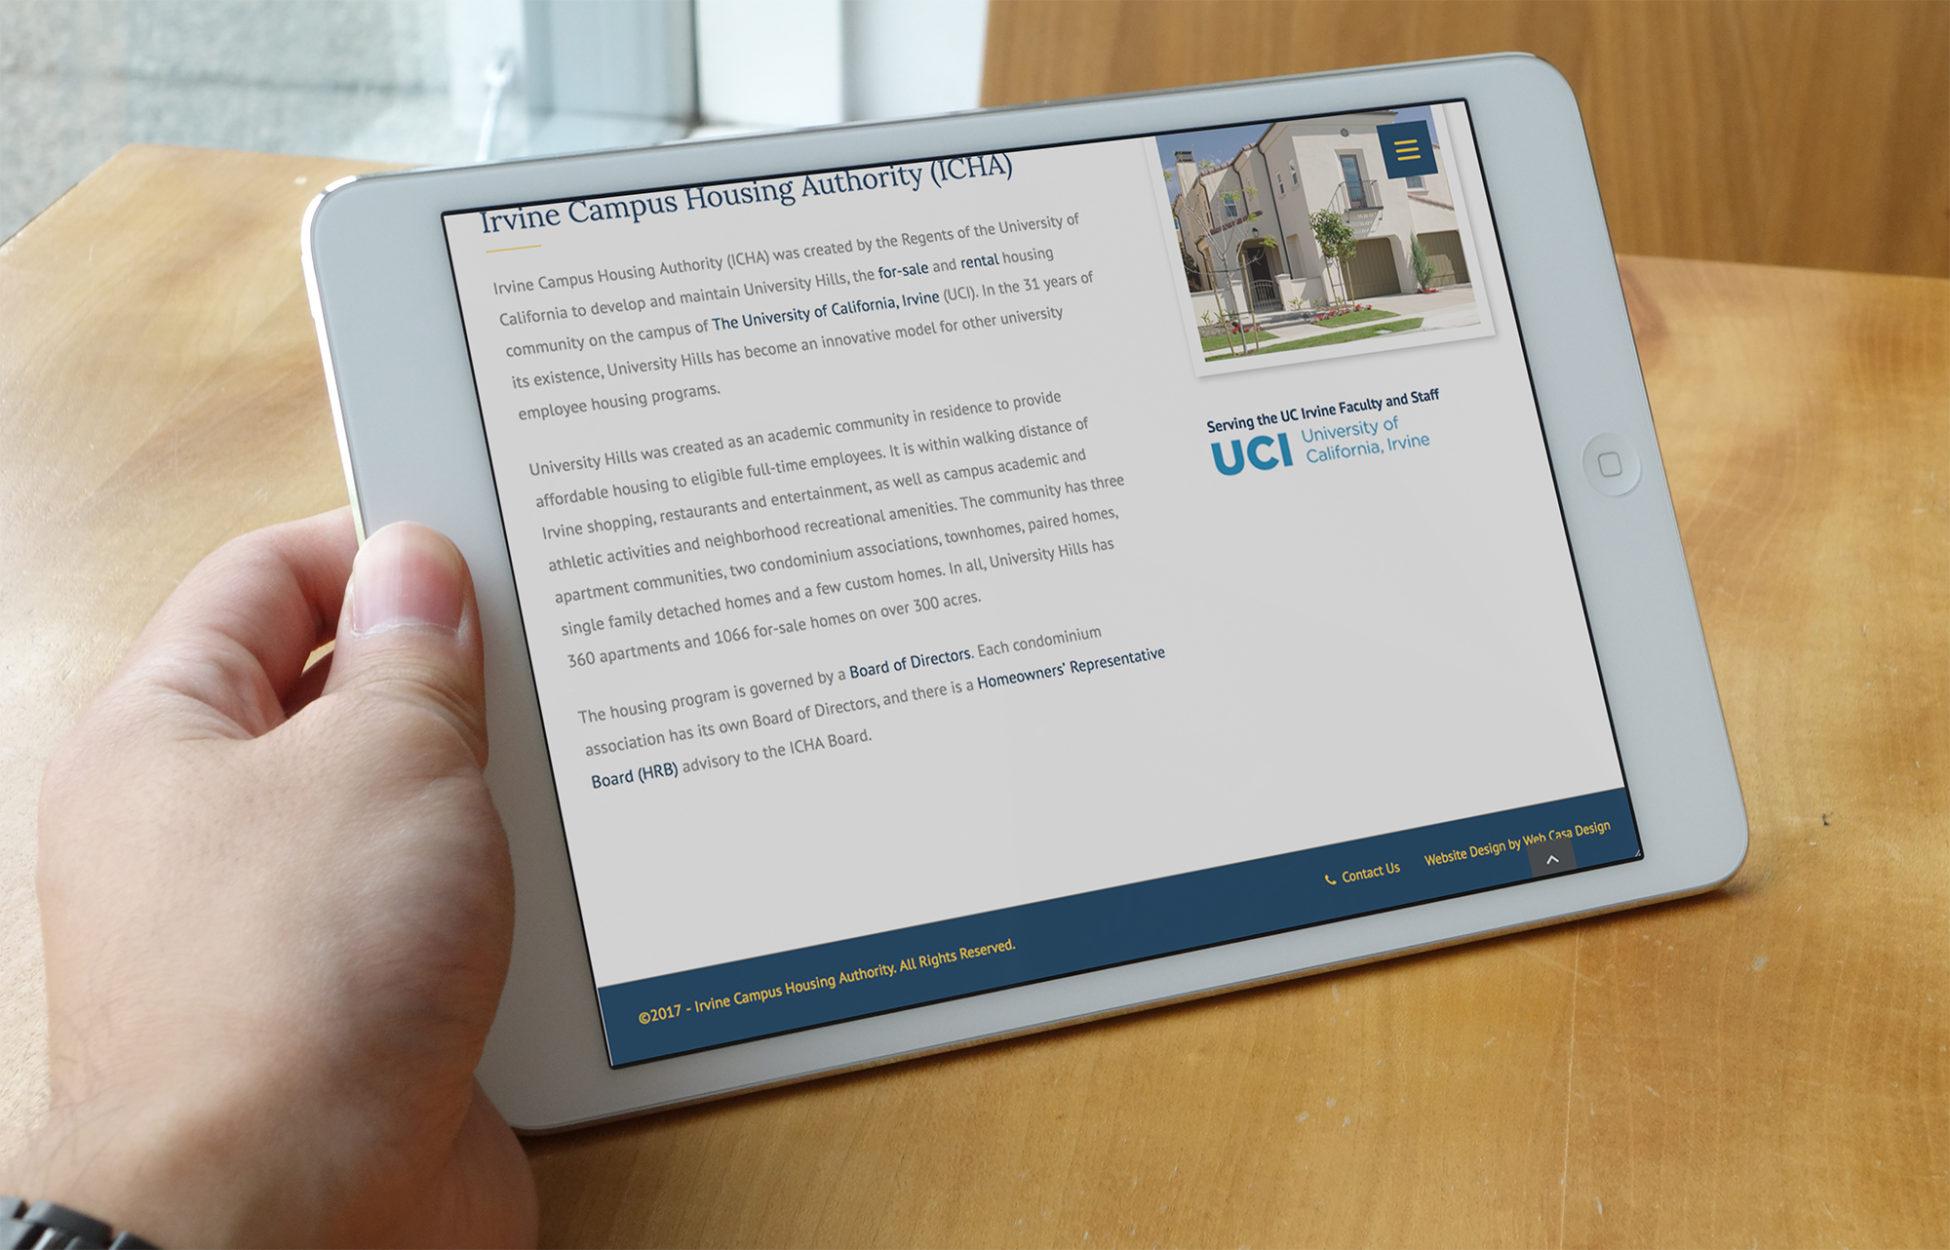 Irvine Campus Housing Authority